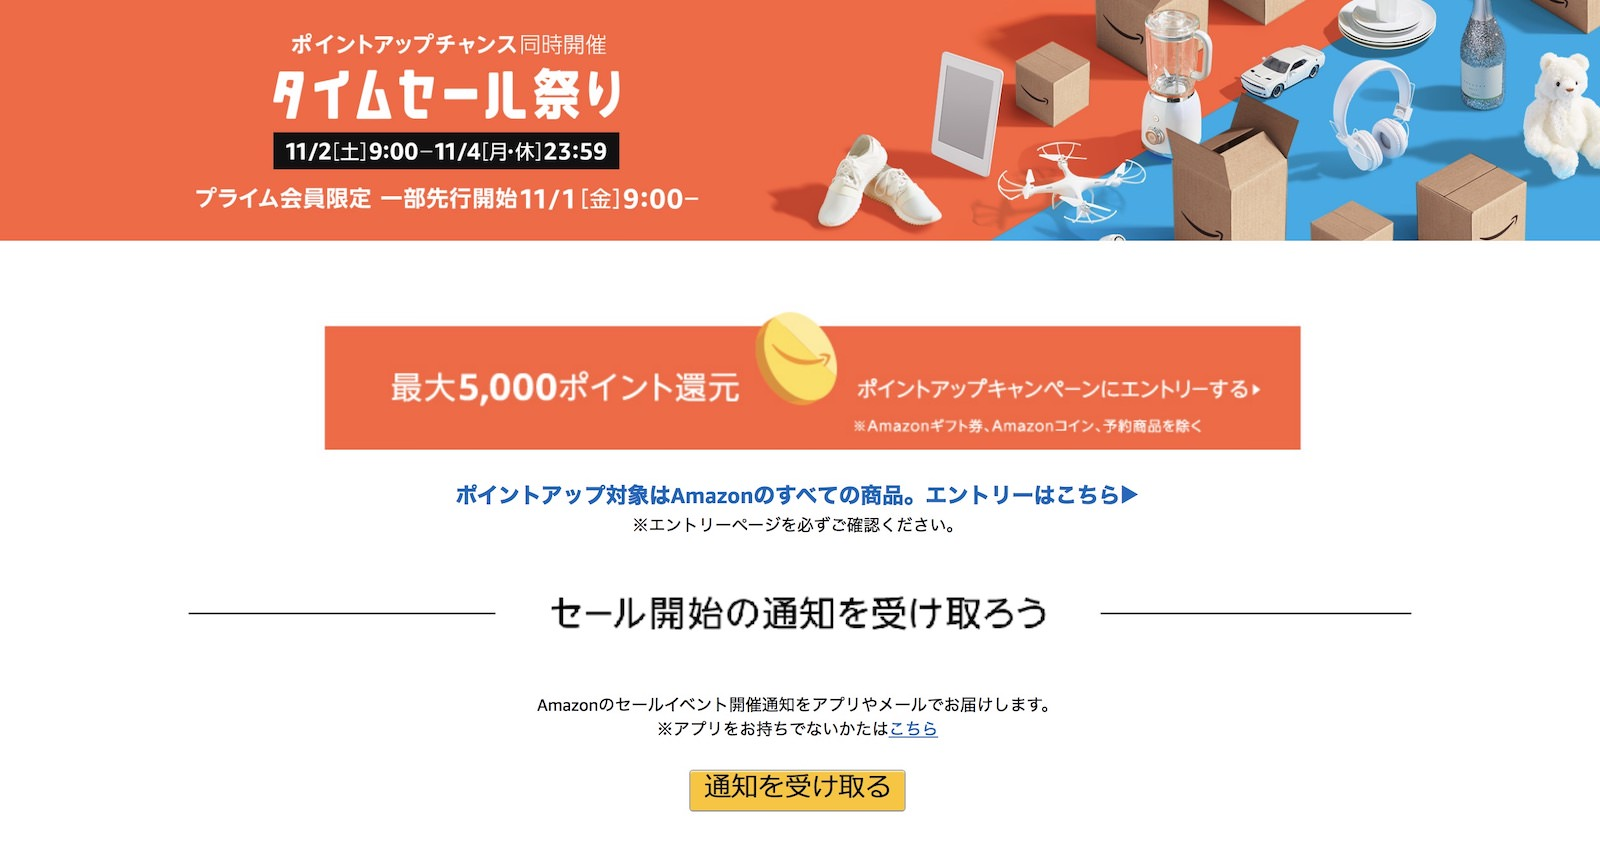 Amazon TimeSale Matsuri